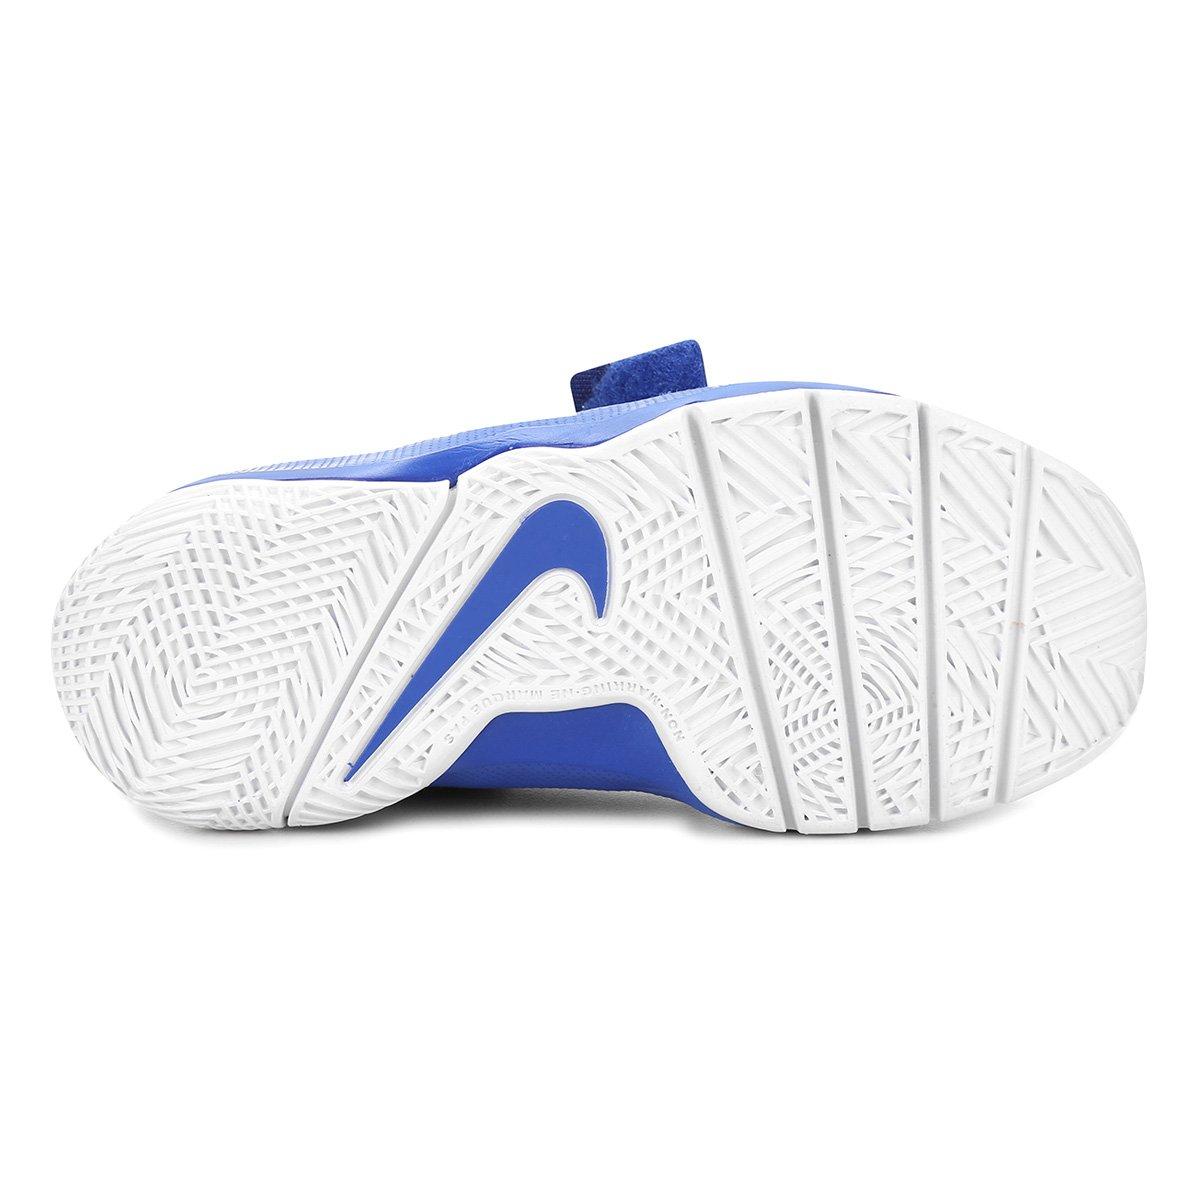 b0363ff53 Tênis Infantil Nike Team Hustle D 8 Masculino - Azul Royal e Preto ...